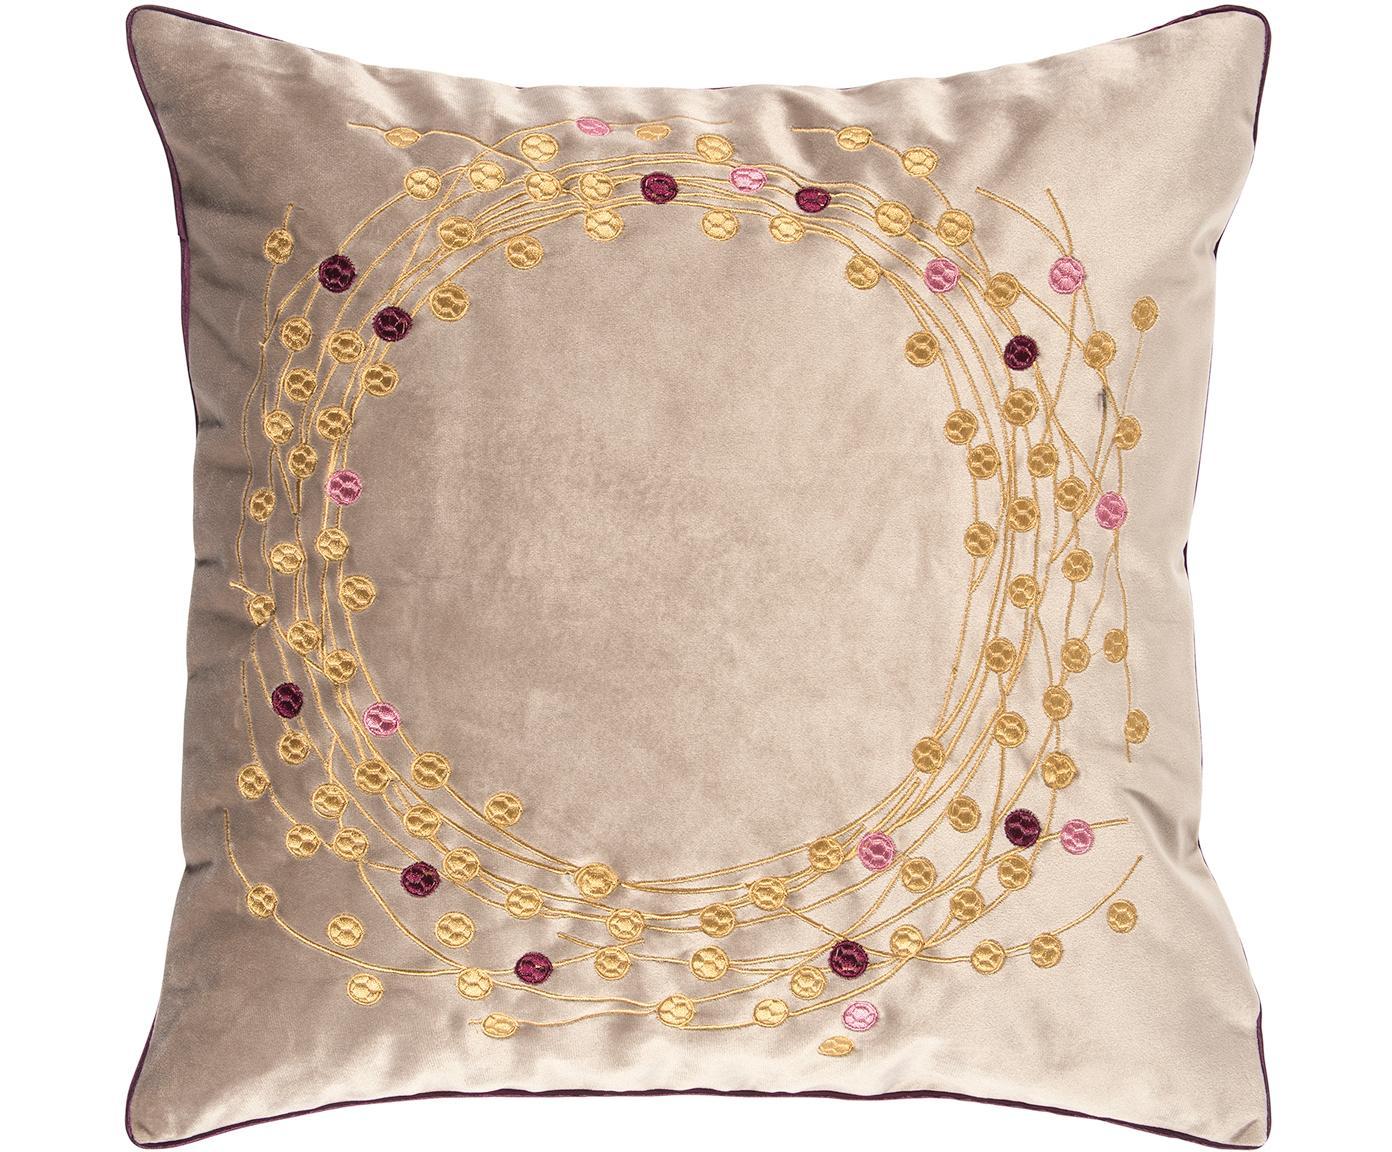 Fluwelen kussenhoes Circle, Polyester fluweel, Zandkleurig, goudkleurig, 45 x 45 cm